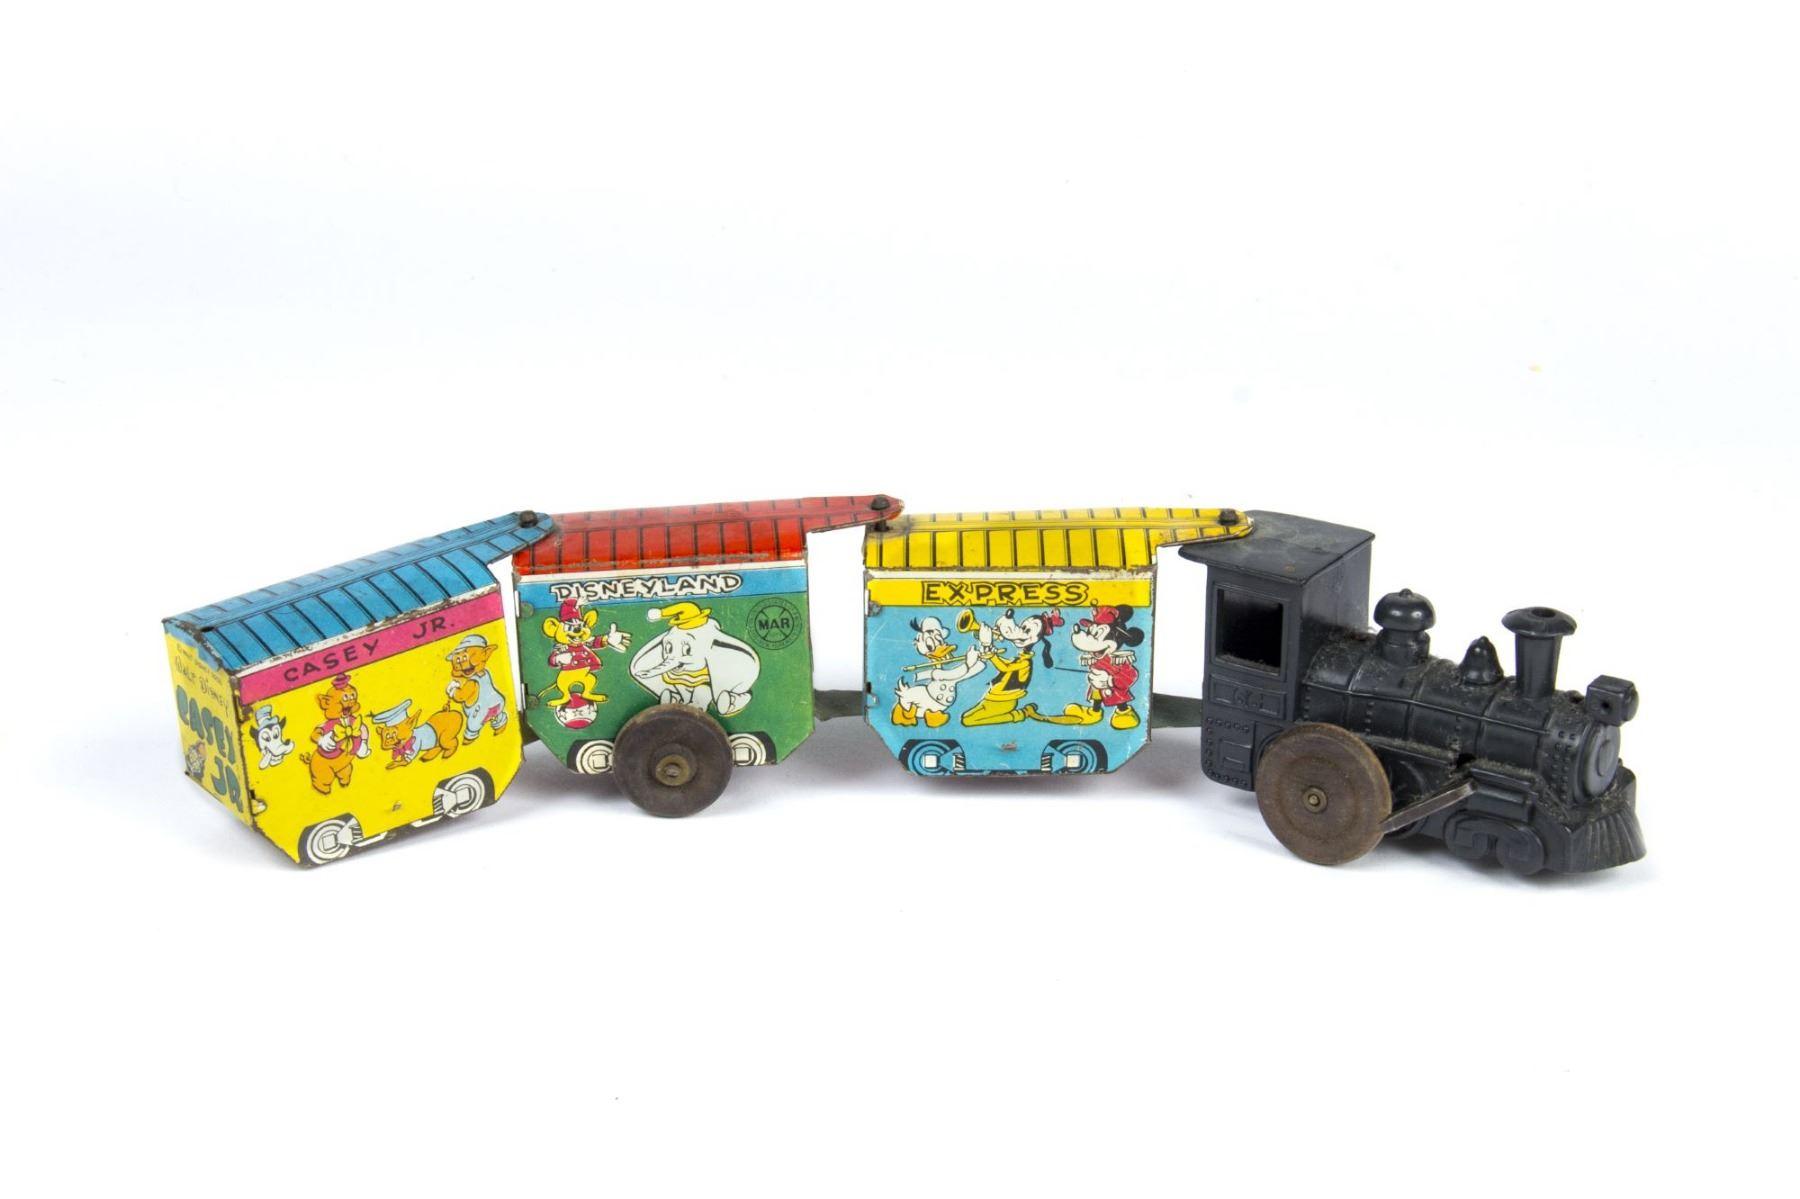 Disneyland Wind-Up Toy Train by Marx